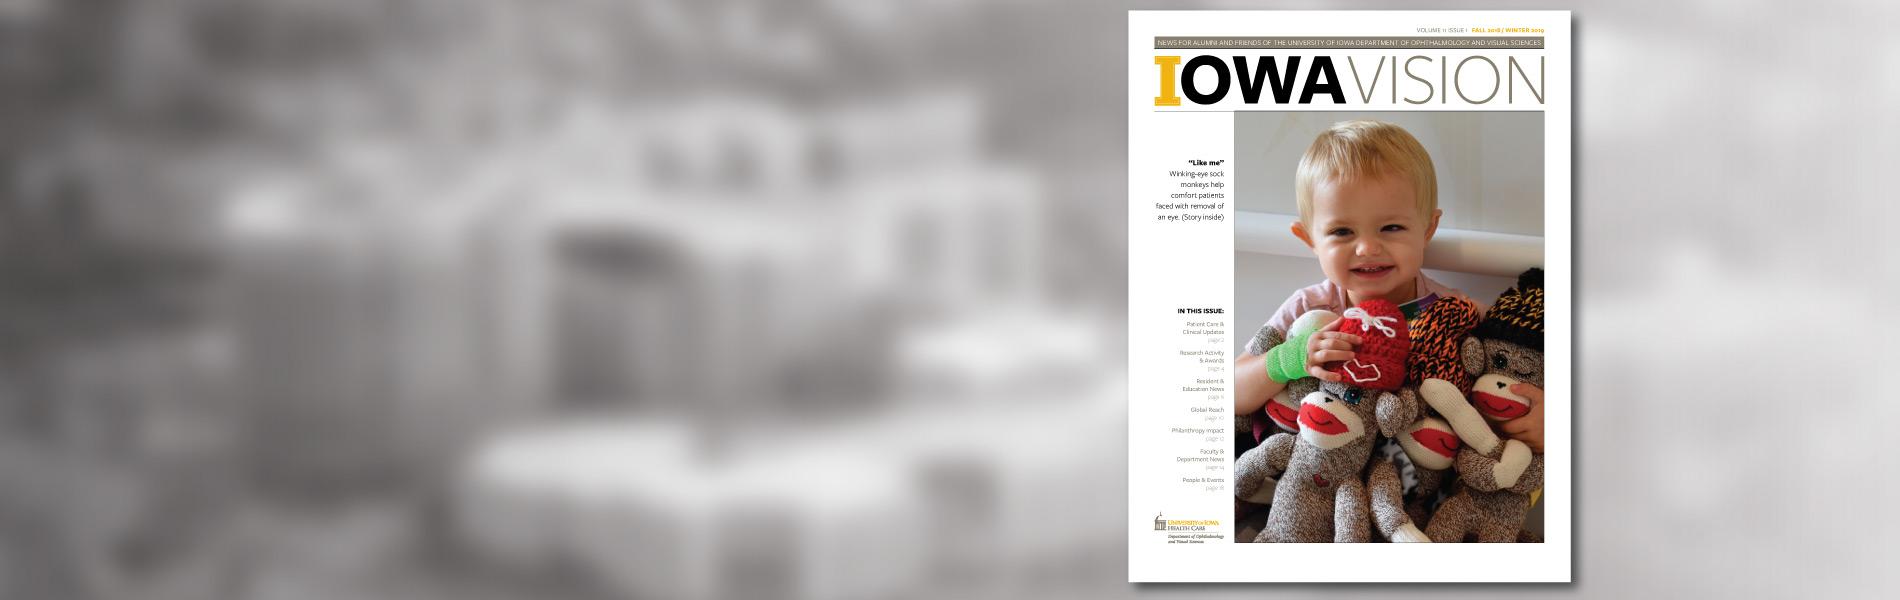 Iowa Vision